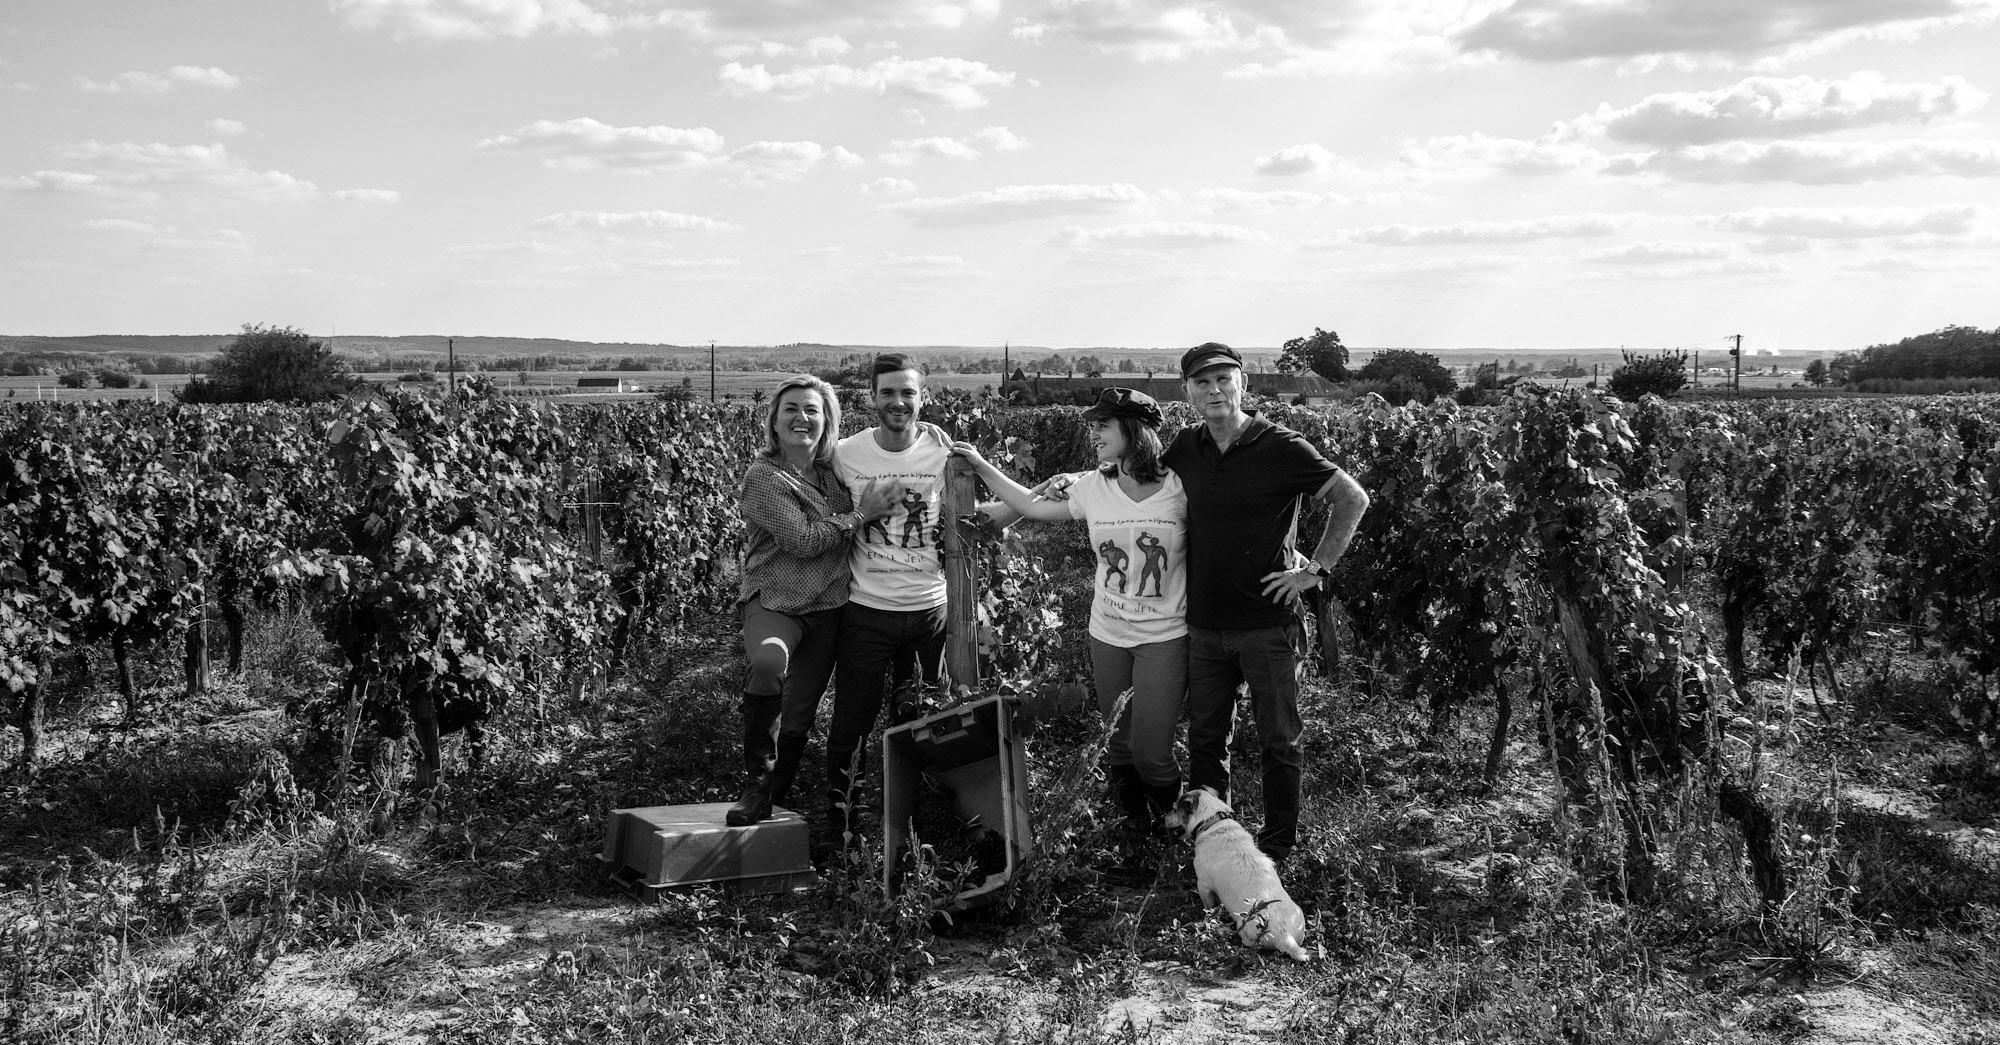 Histoire de rencontre 11 - Famille Breton